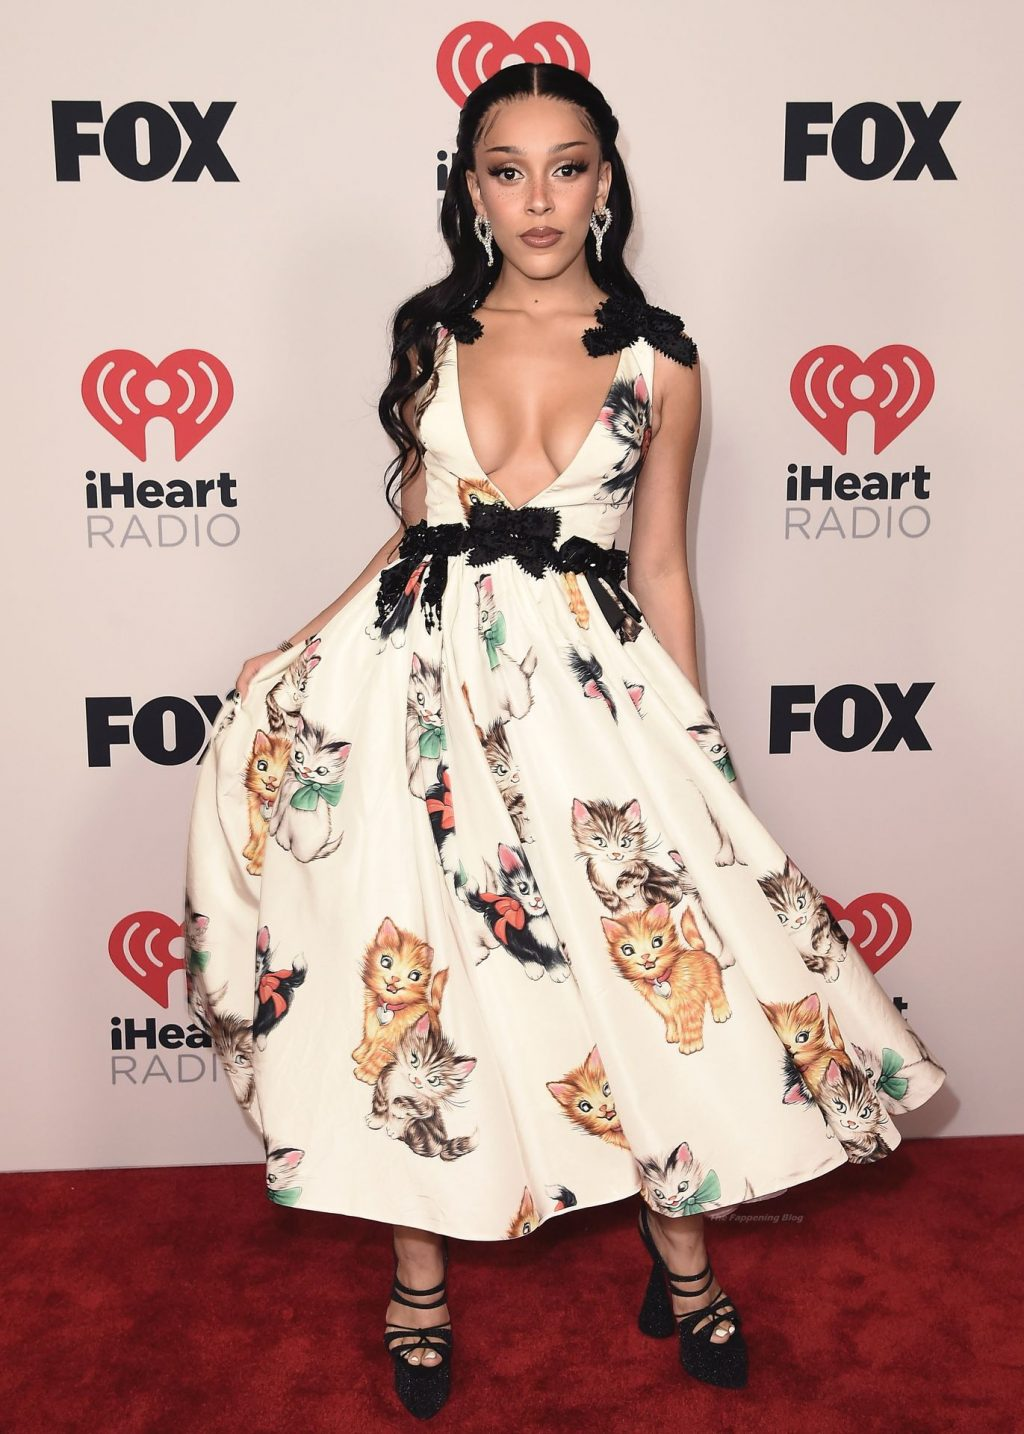 Doja Cat Displays Her Tits With The Best New Pop Artist Award (34 Photos)